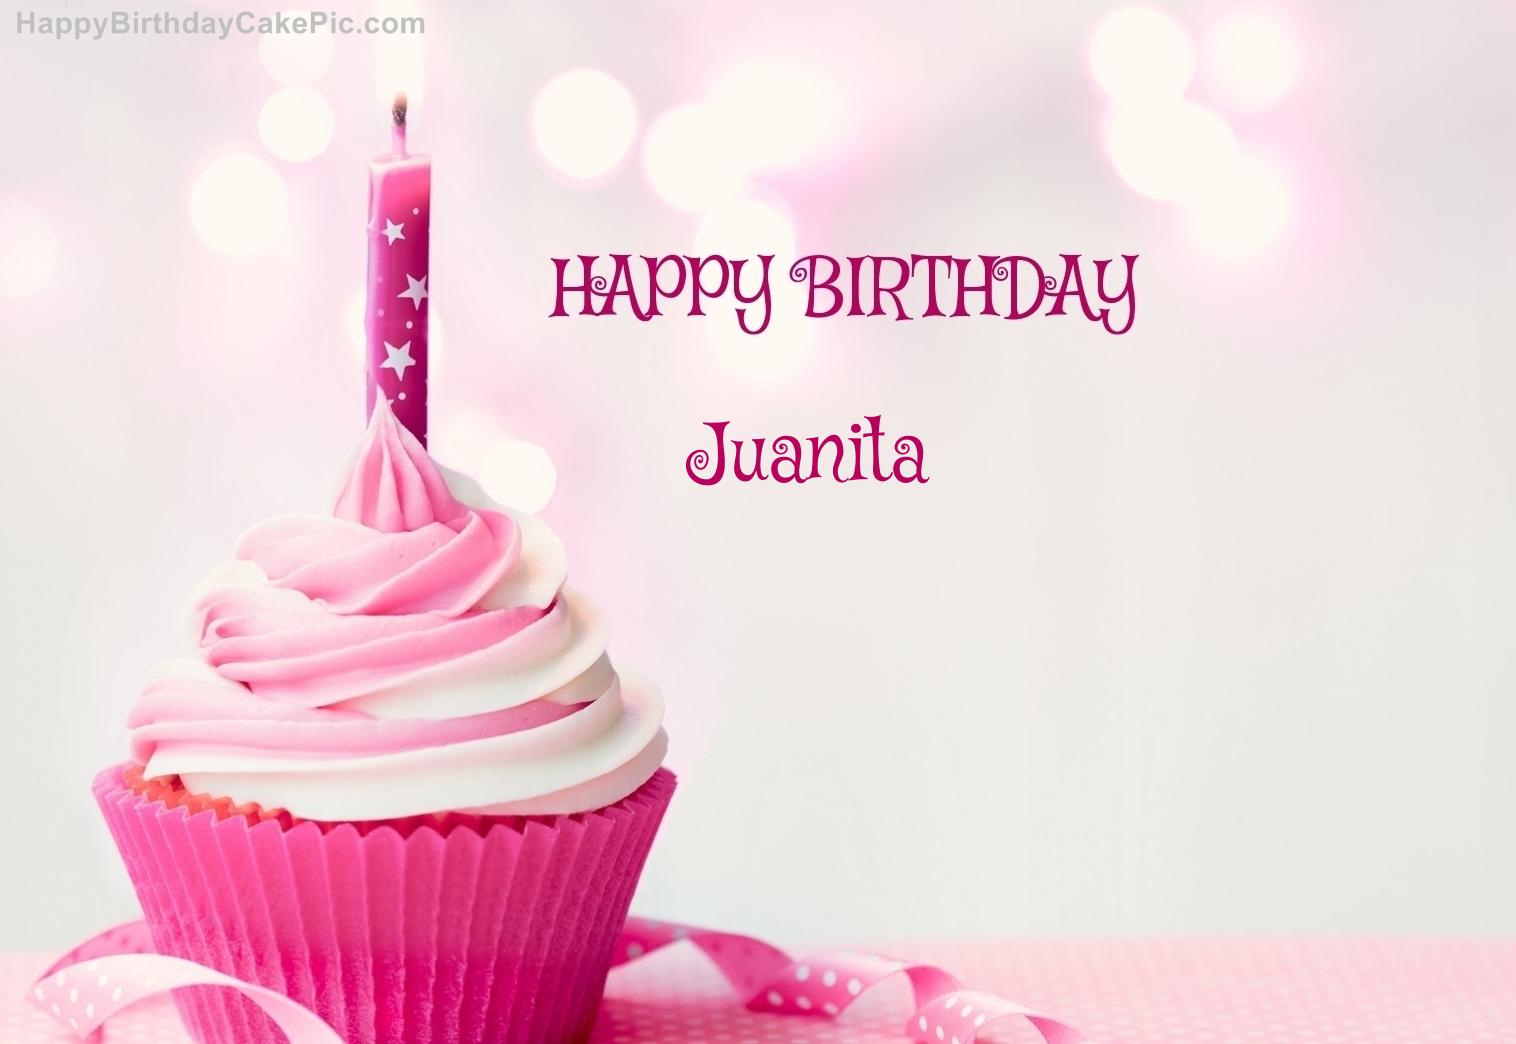 Happy Birthday Cupcake Candle Pink Cake For Juanita